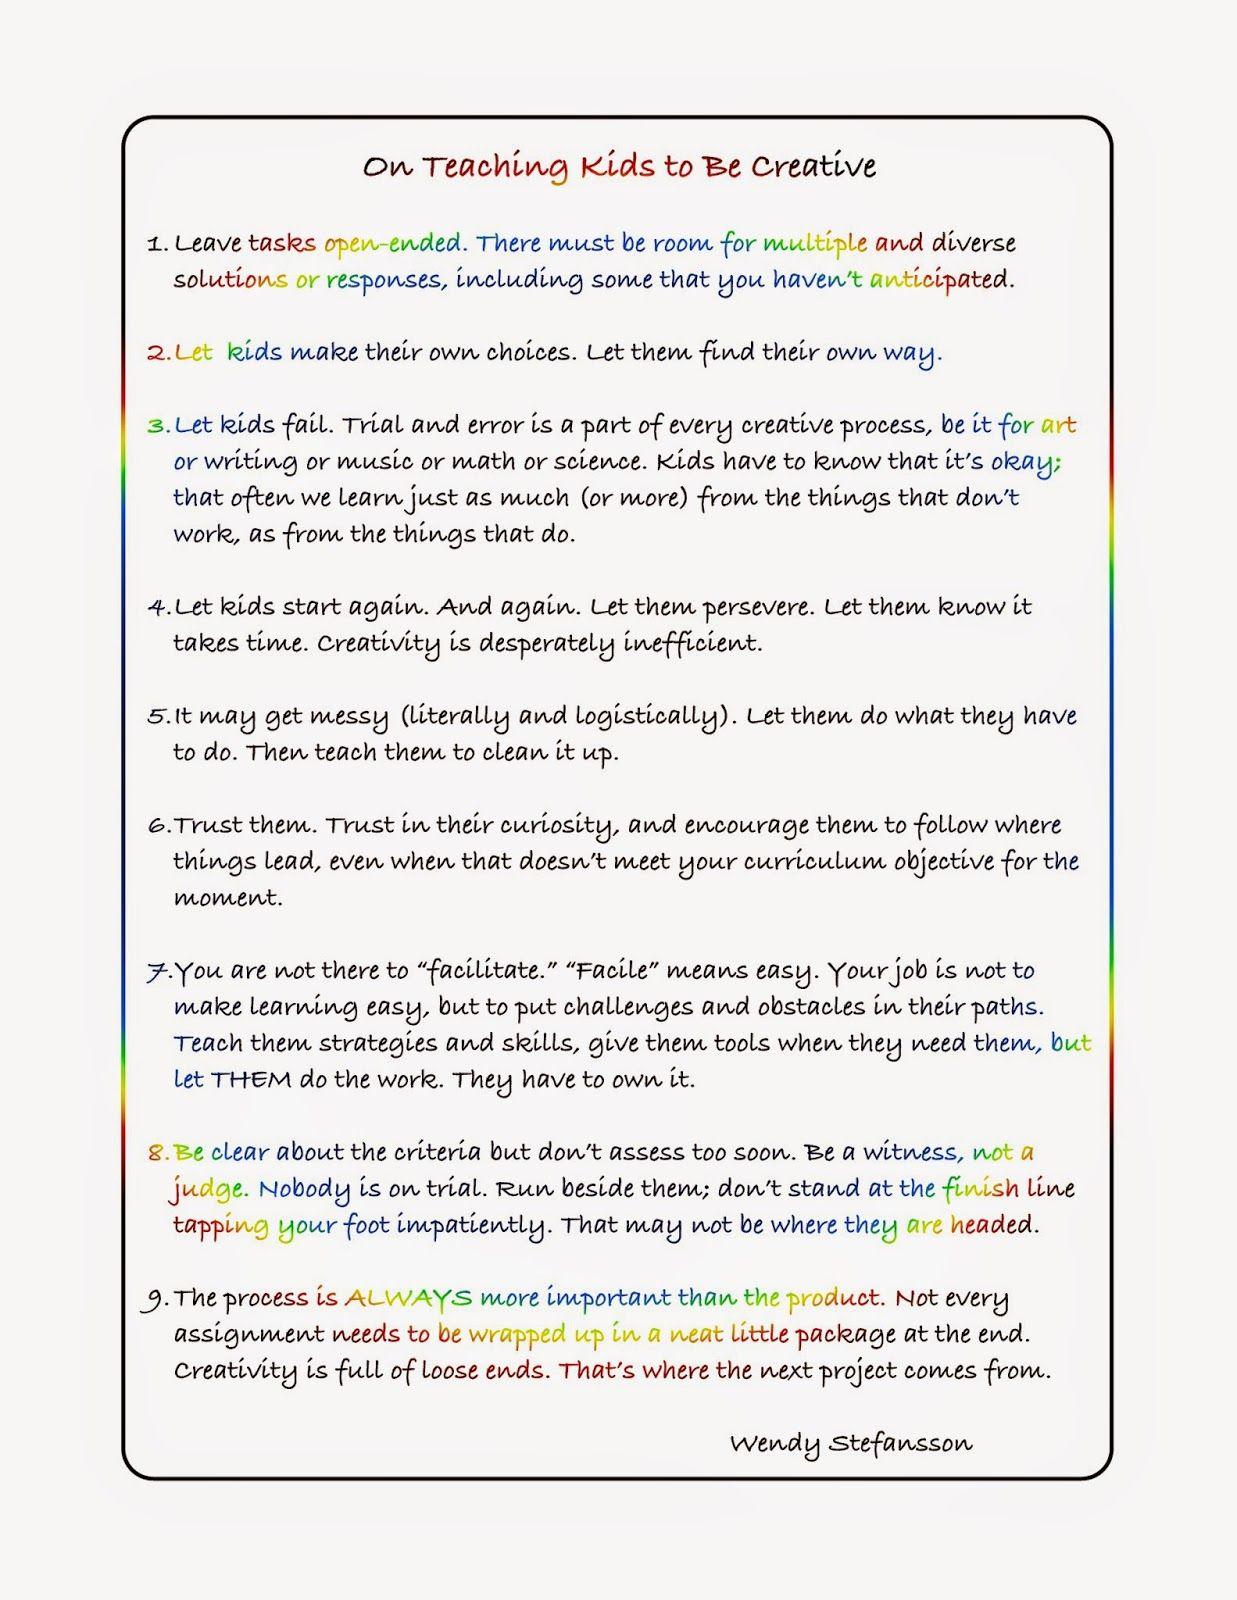 My Creed Teaching Philosophy Teaching Teaching Philosophy Examples